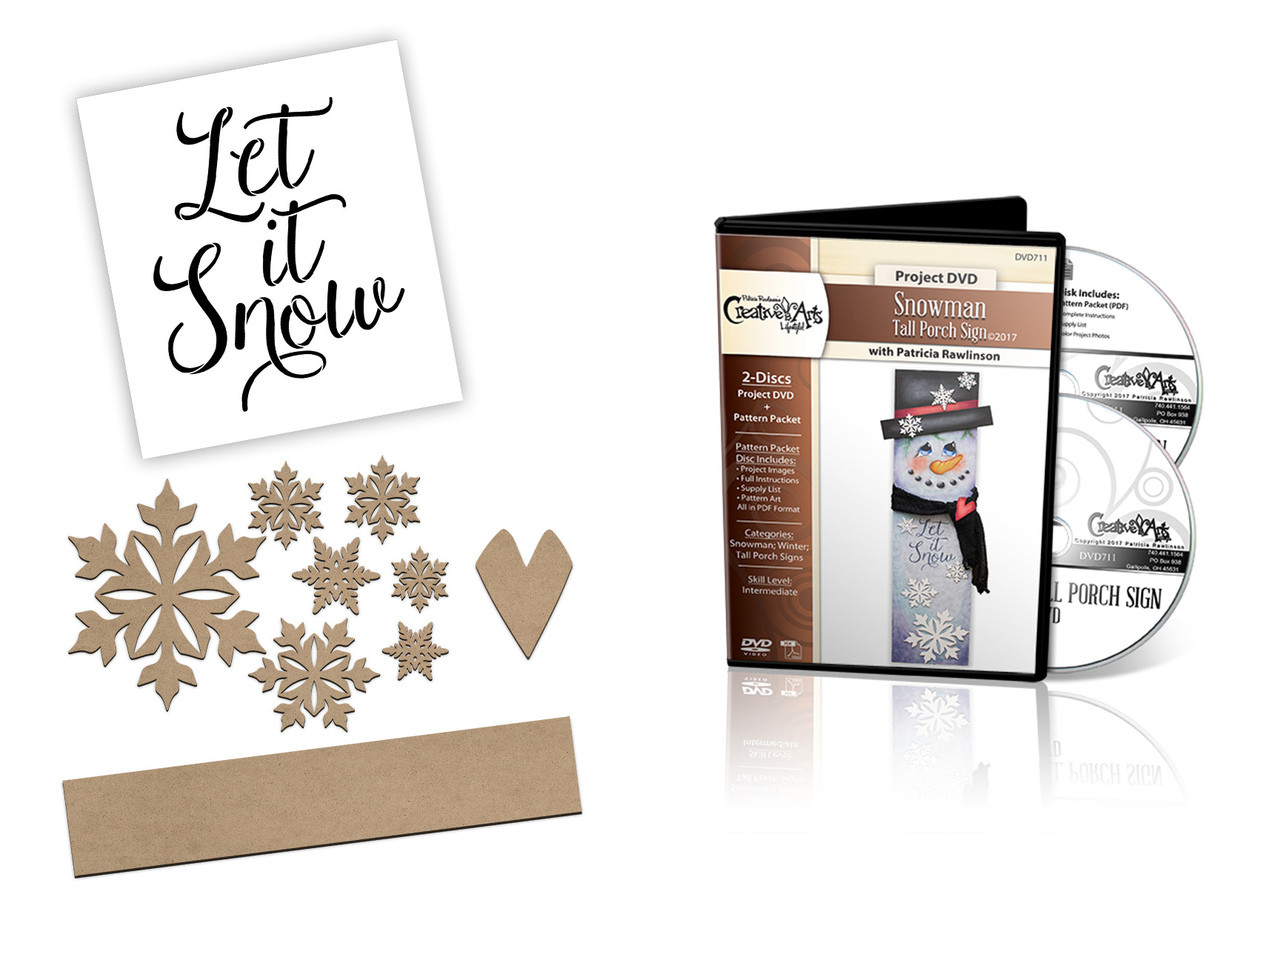 Snowman Tall Porch Sign Deluxe DVD Set